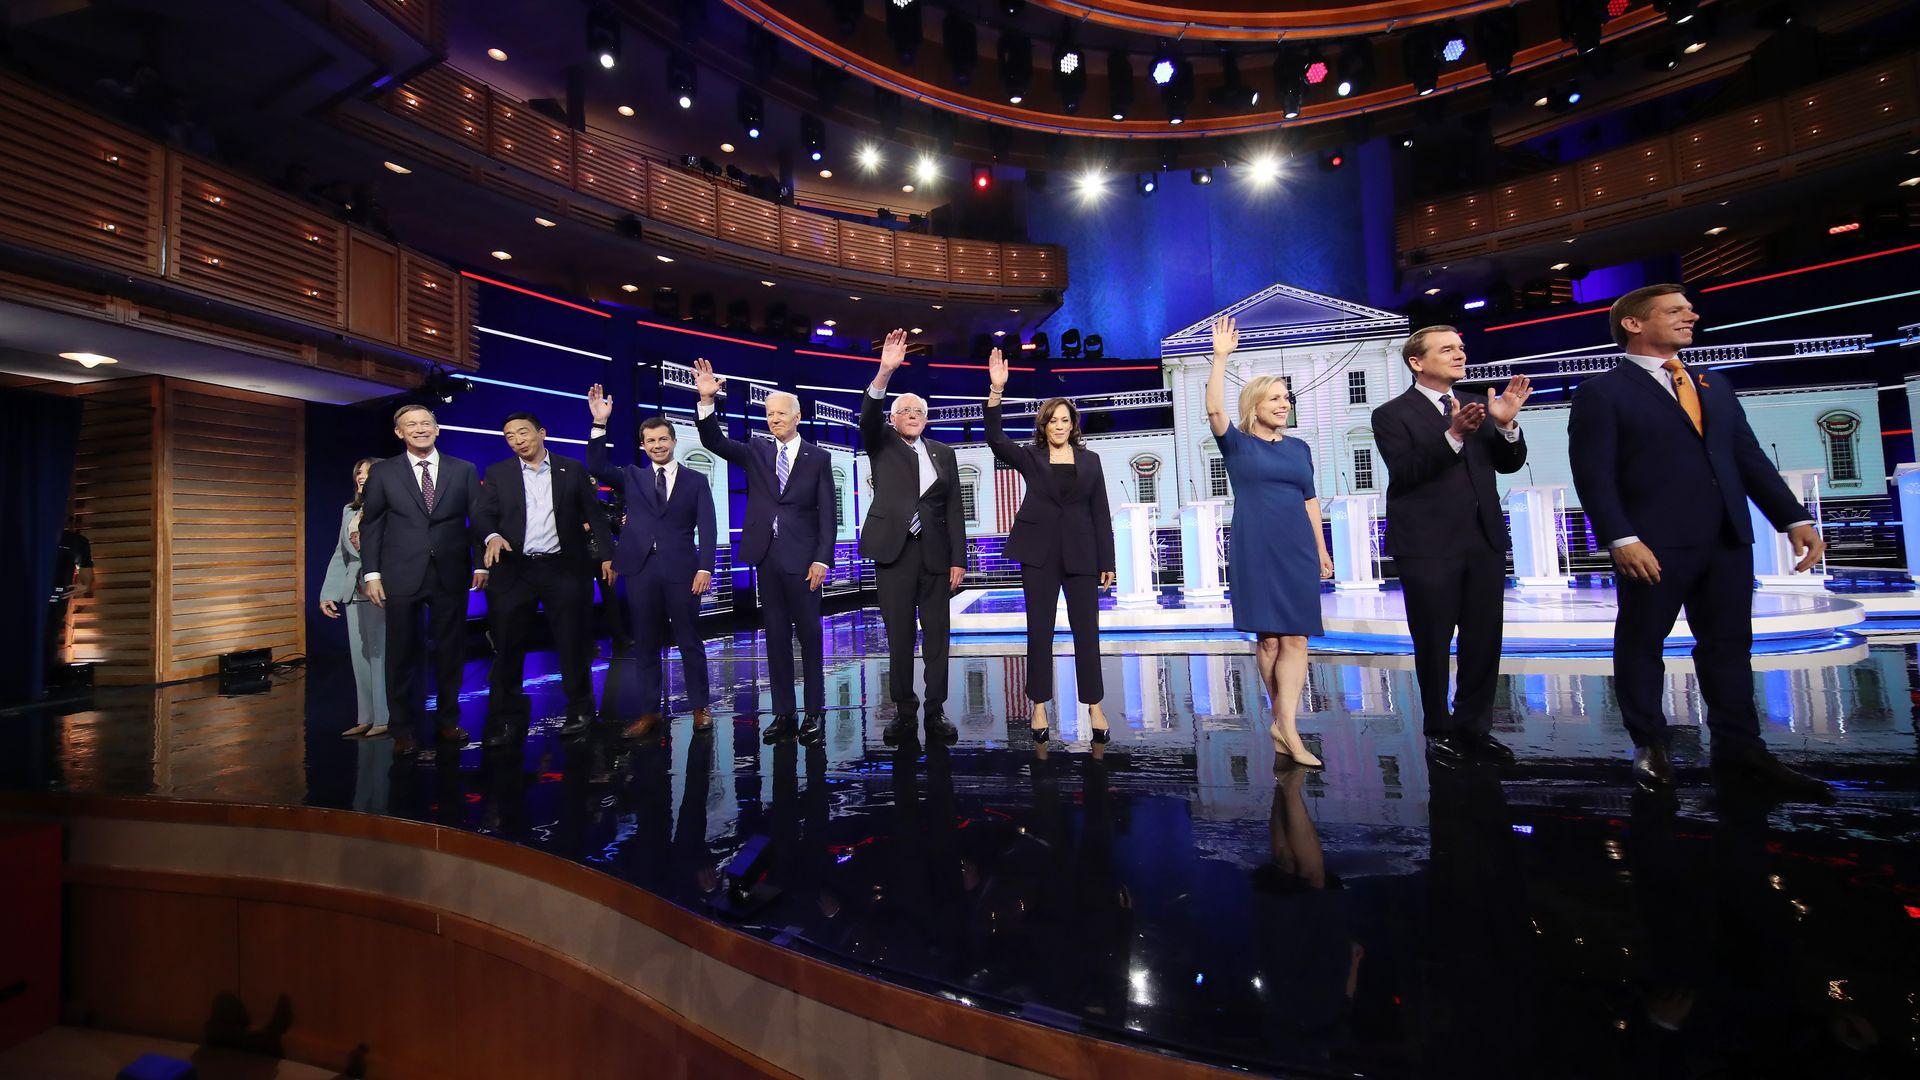 2020 Democratic debates on the second night of debates